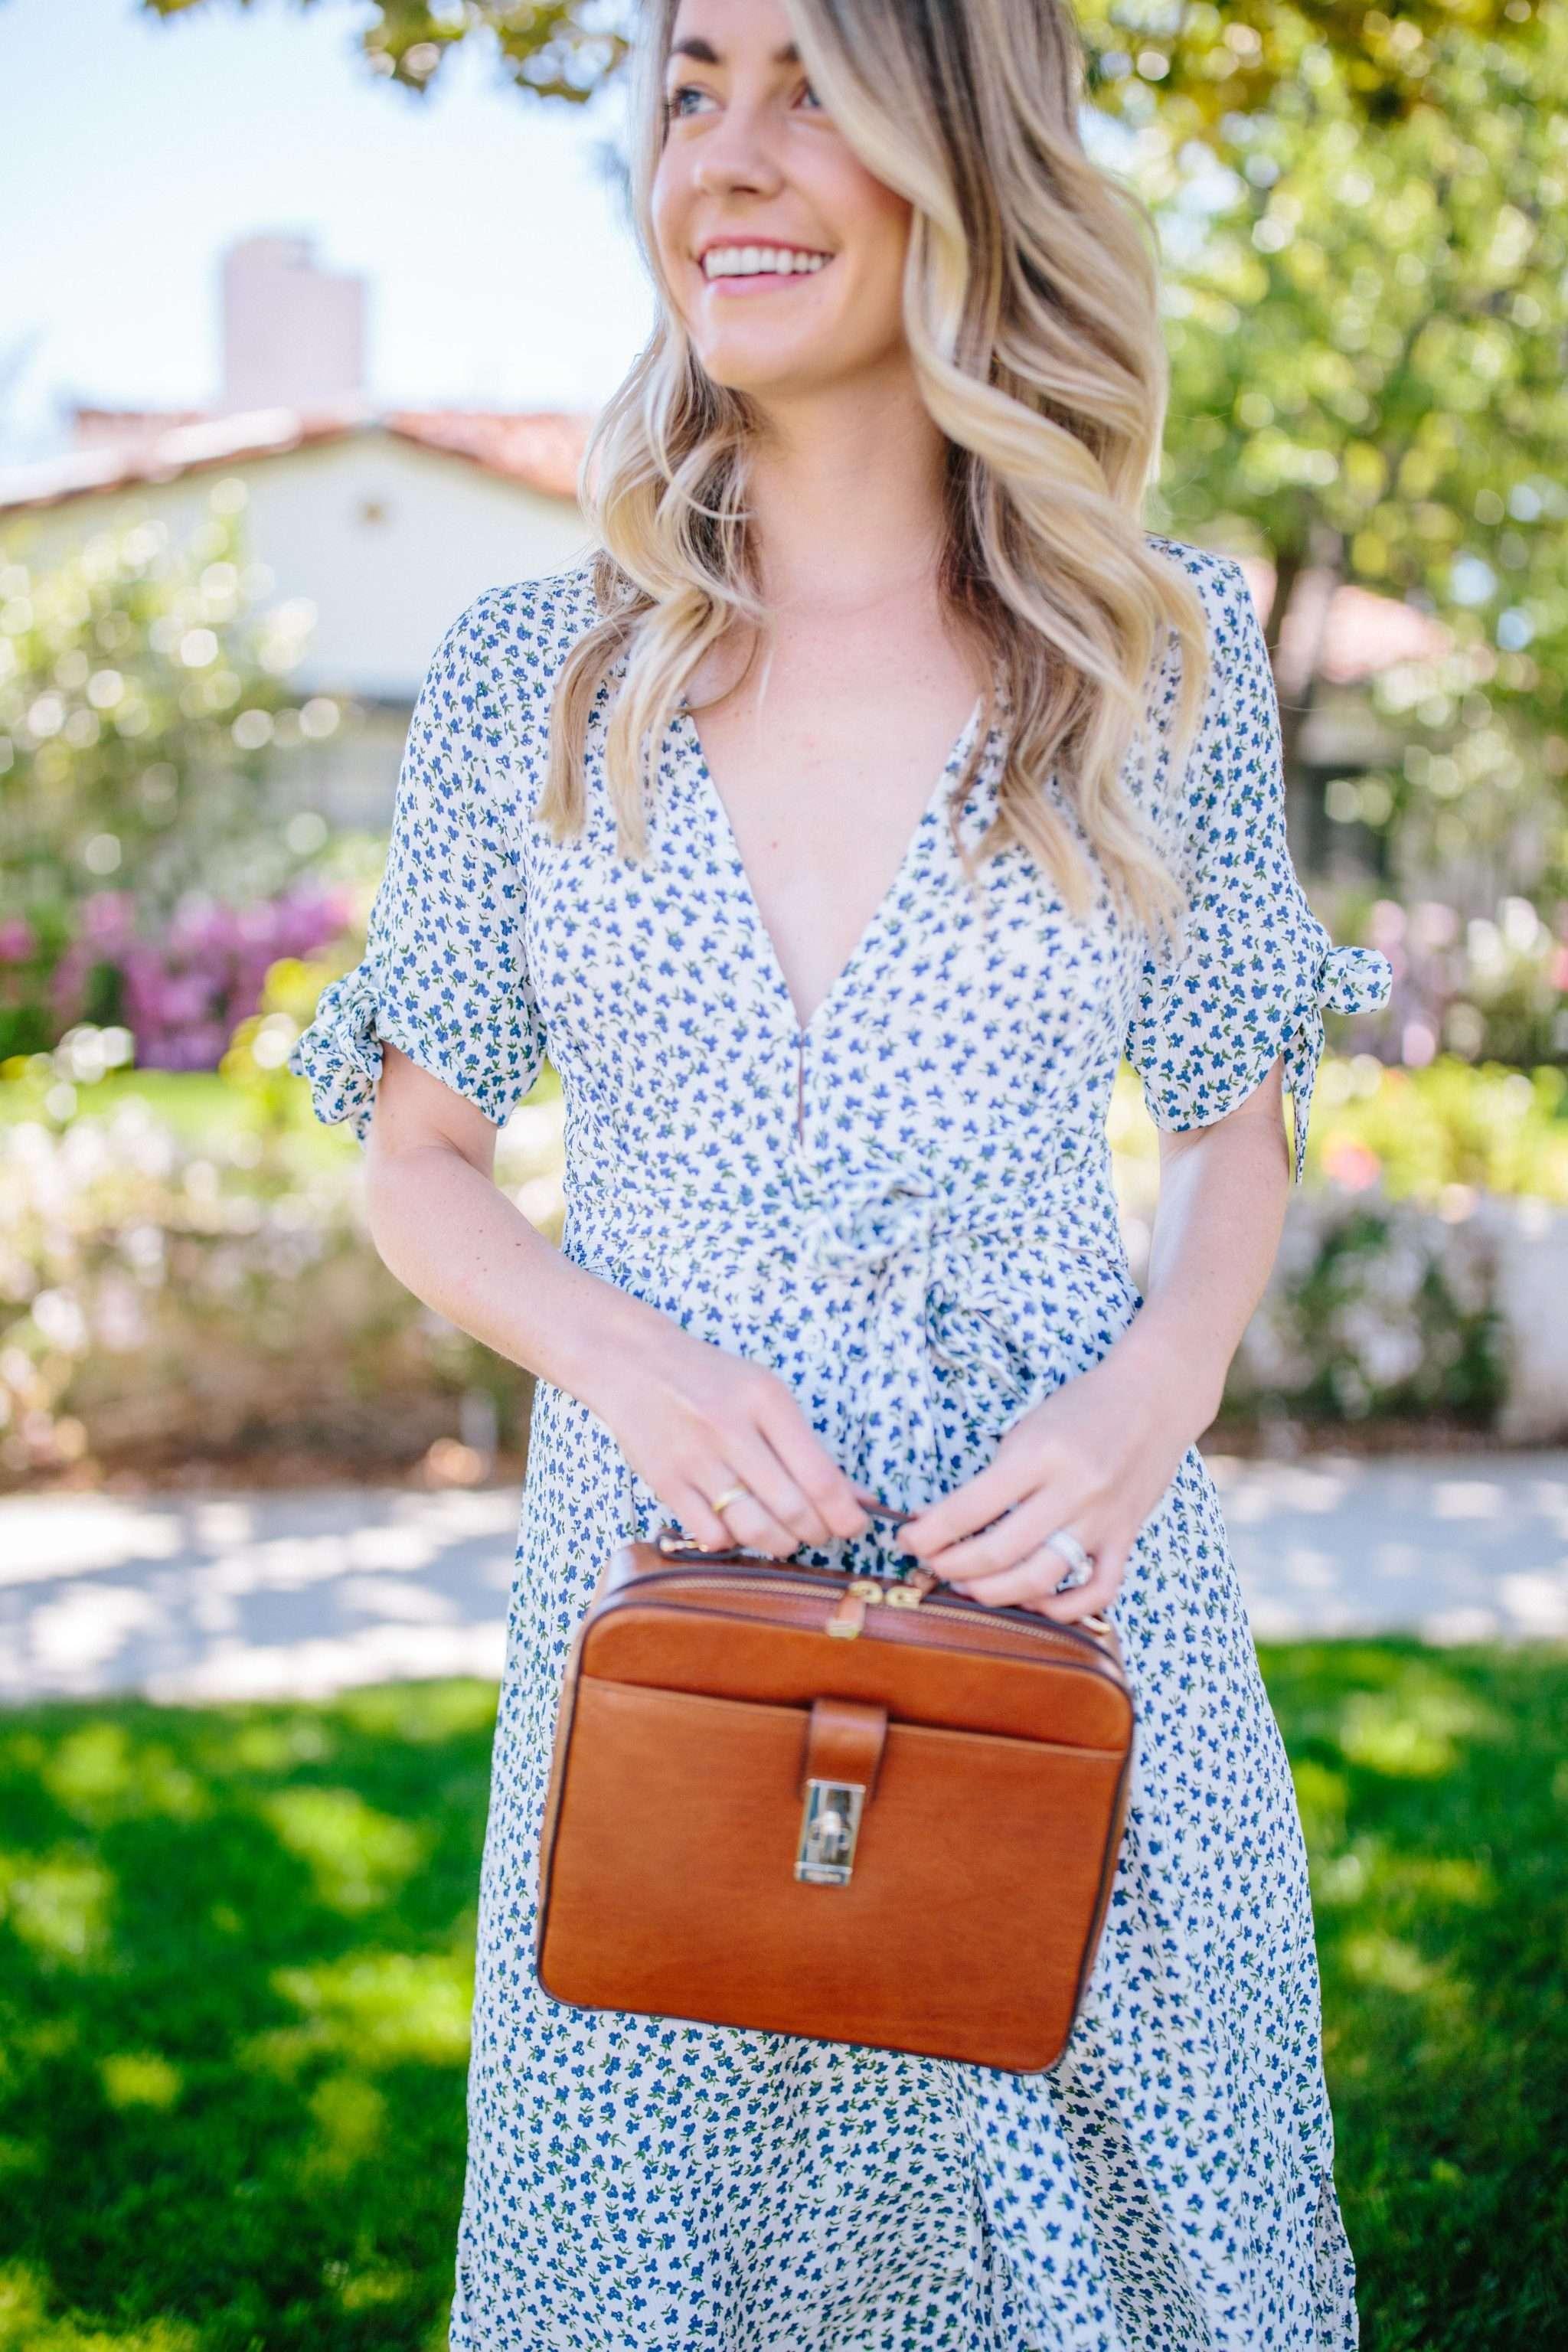 Handbag line to love: Brahmin + my favorite Brahmin purses for spring and summer | Rhyme & Reason